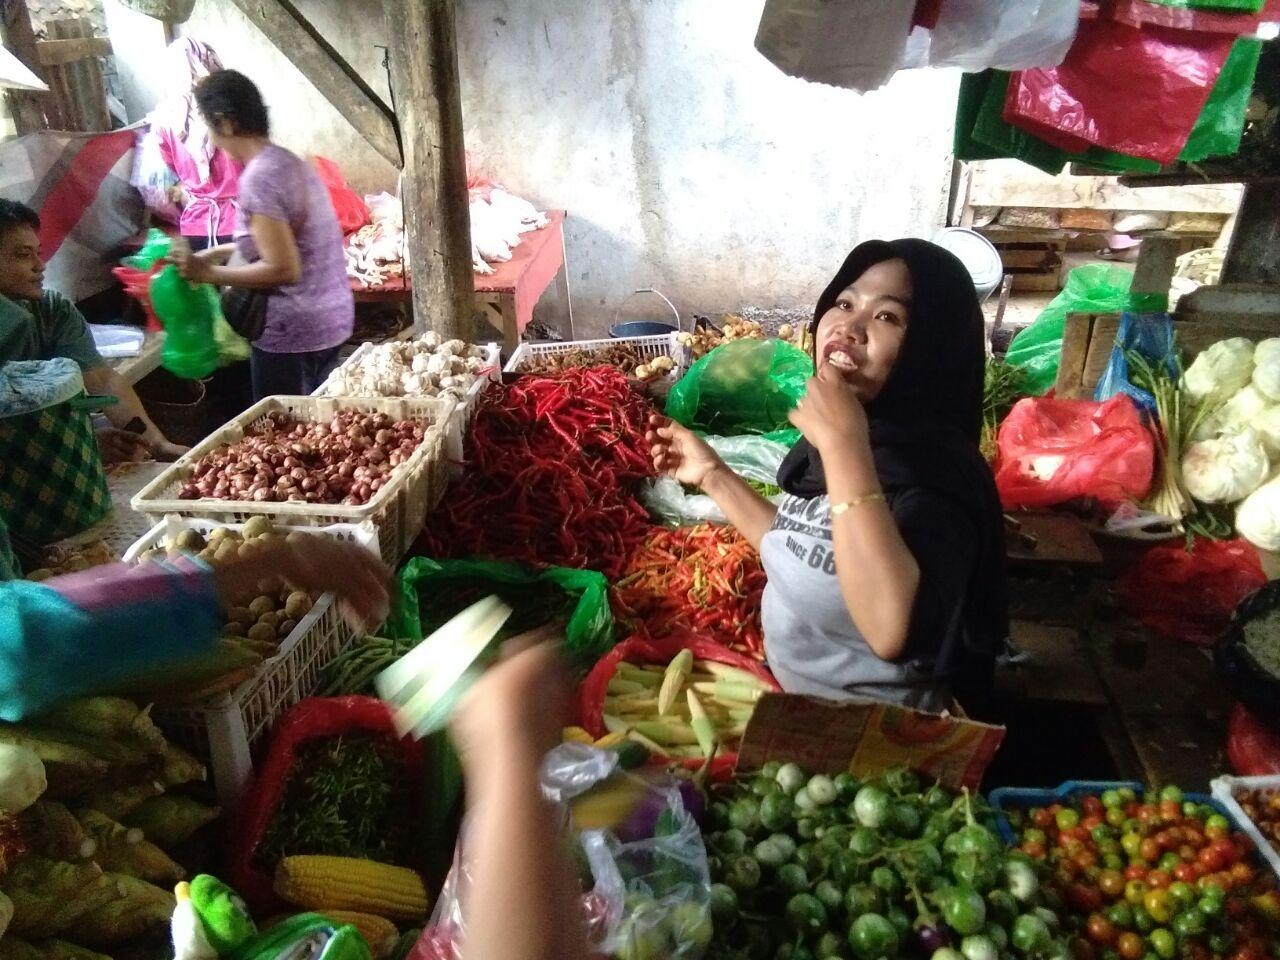 Harga Cabai Merah di Pasar Tempel Rajabasa Meroket